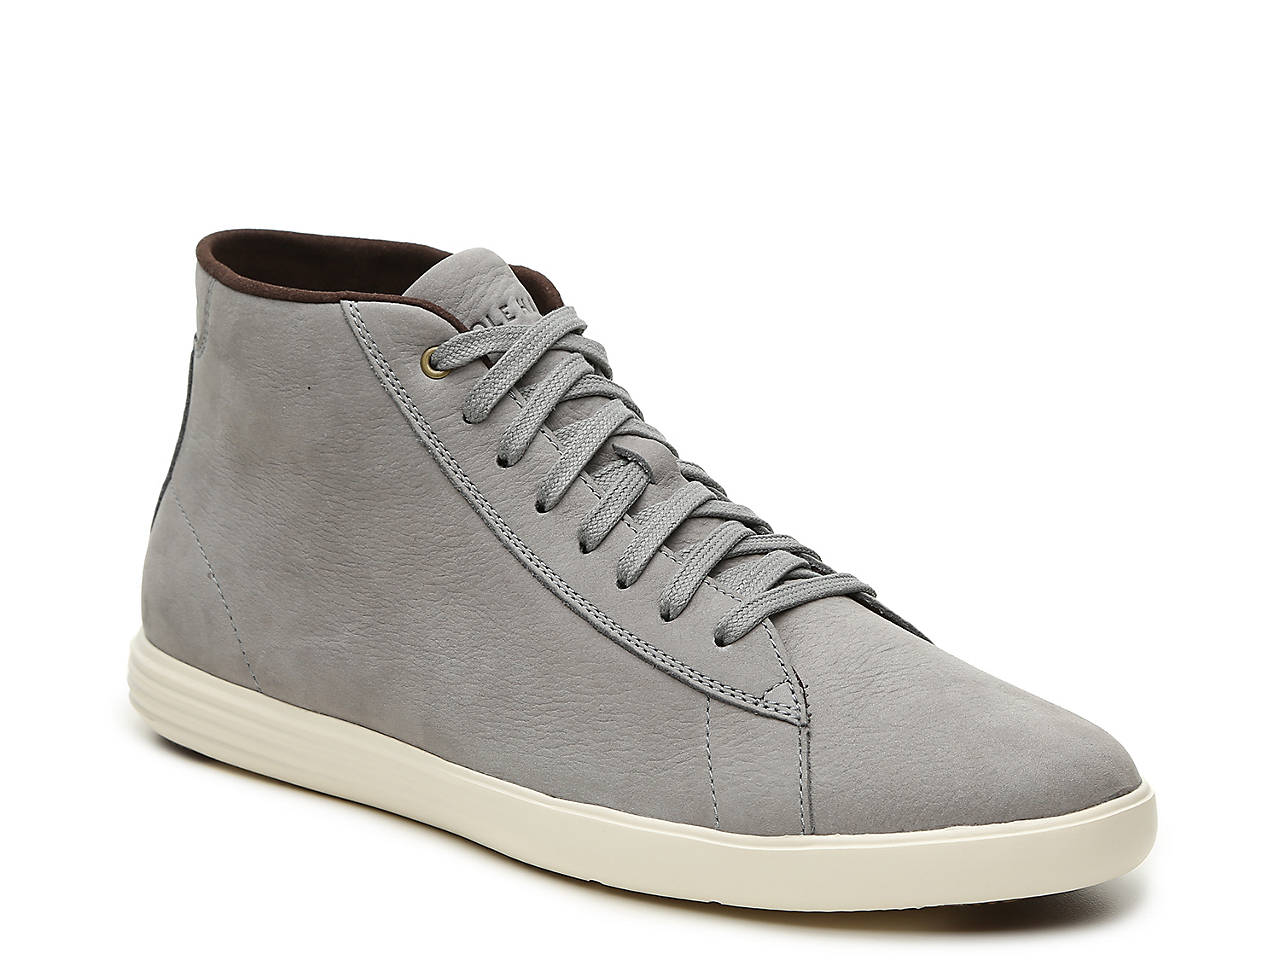 a18cfcc783 Cole Haan Grand Crosscourt High-Top Sneaker - Men's Men's Shoes | DSW